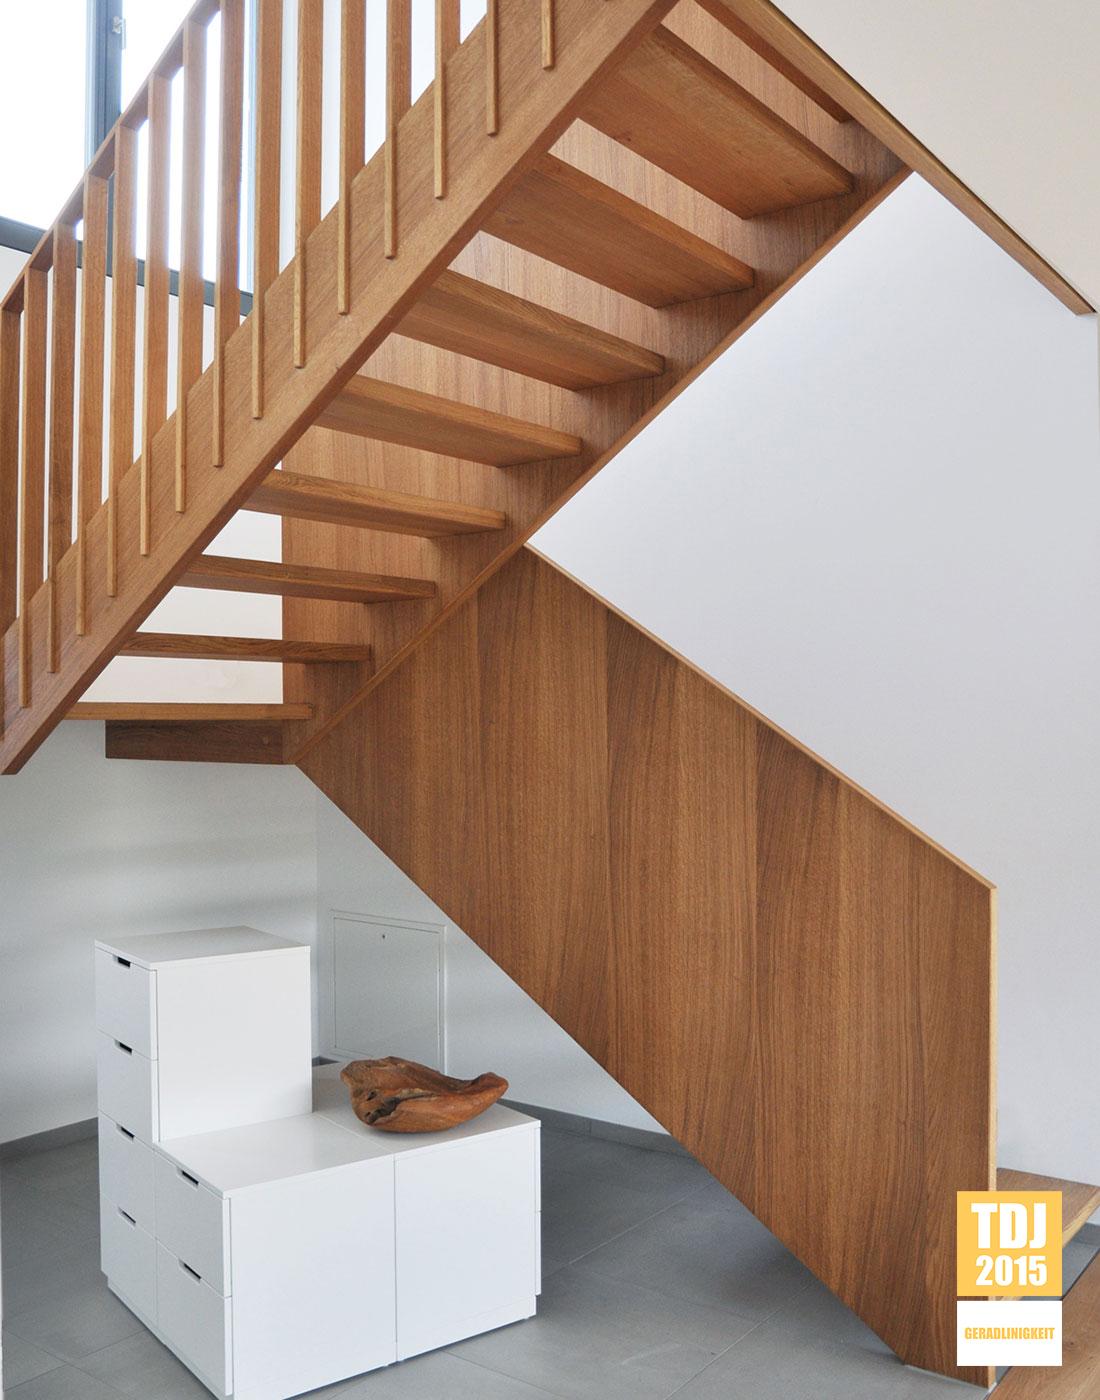 Treppen Frankfurt treppenbau diehl plz 60435 frankfurt eichenholzwangentreppe